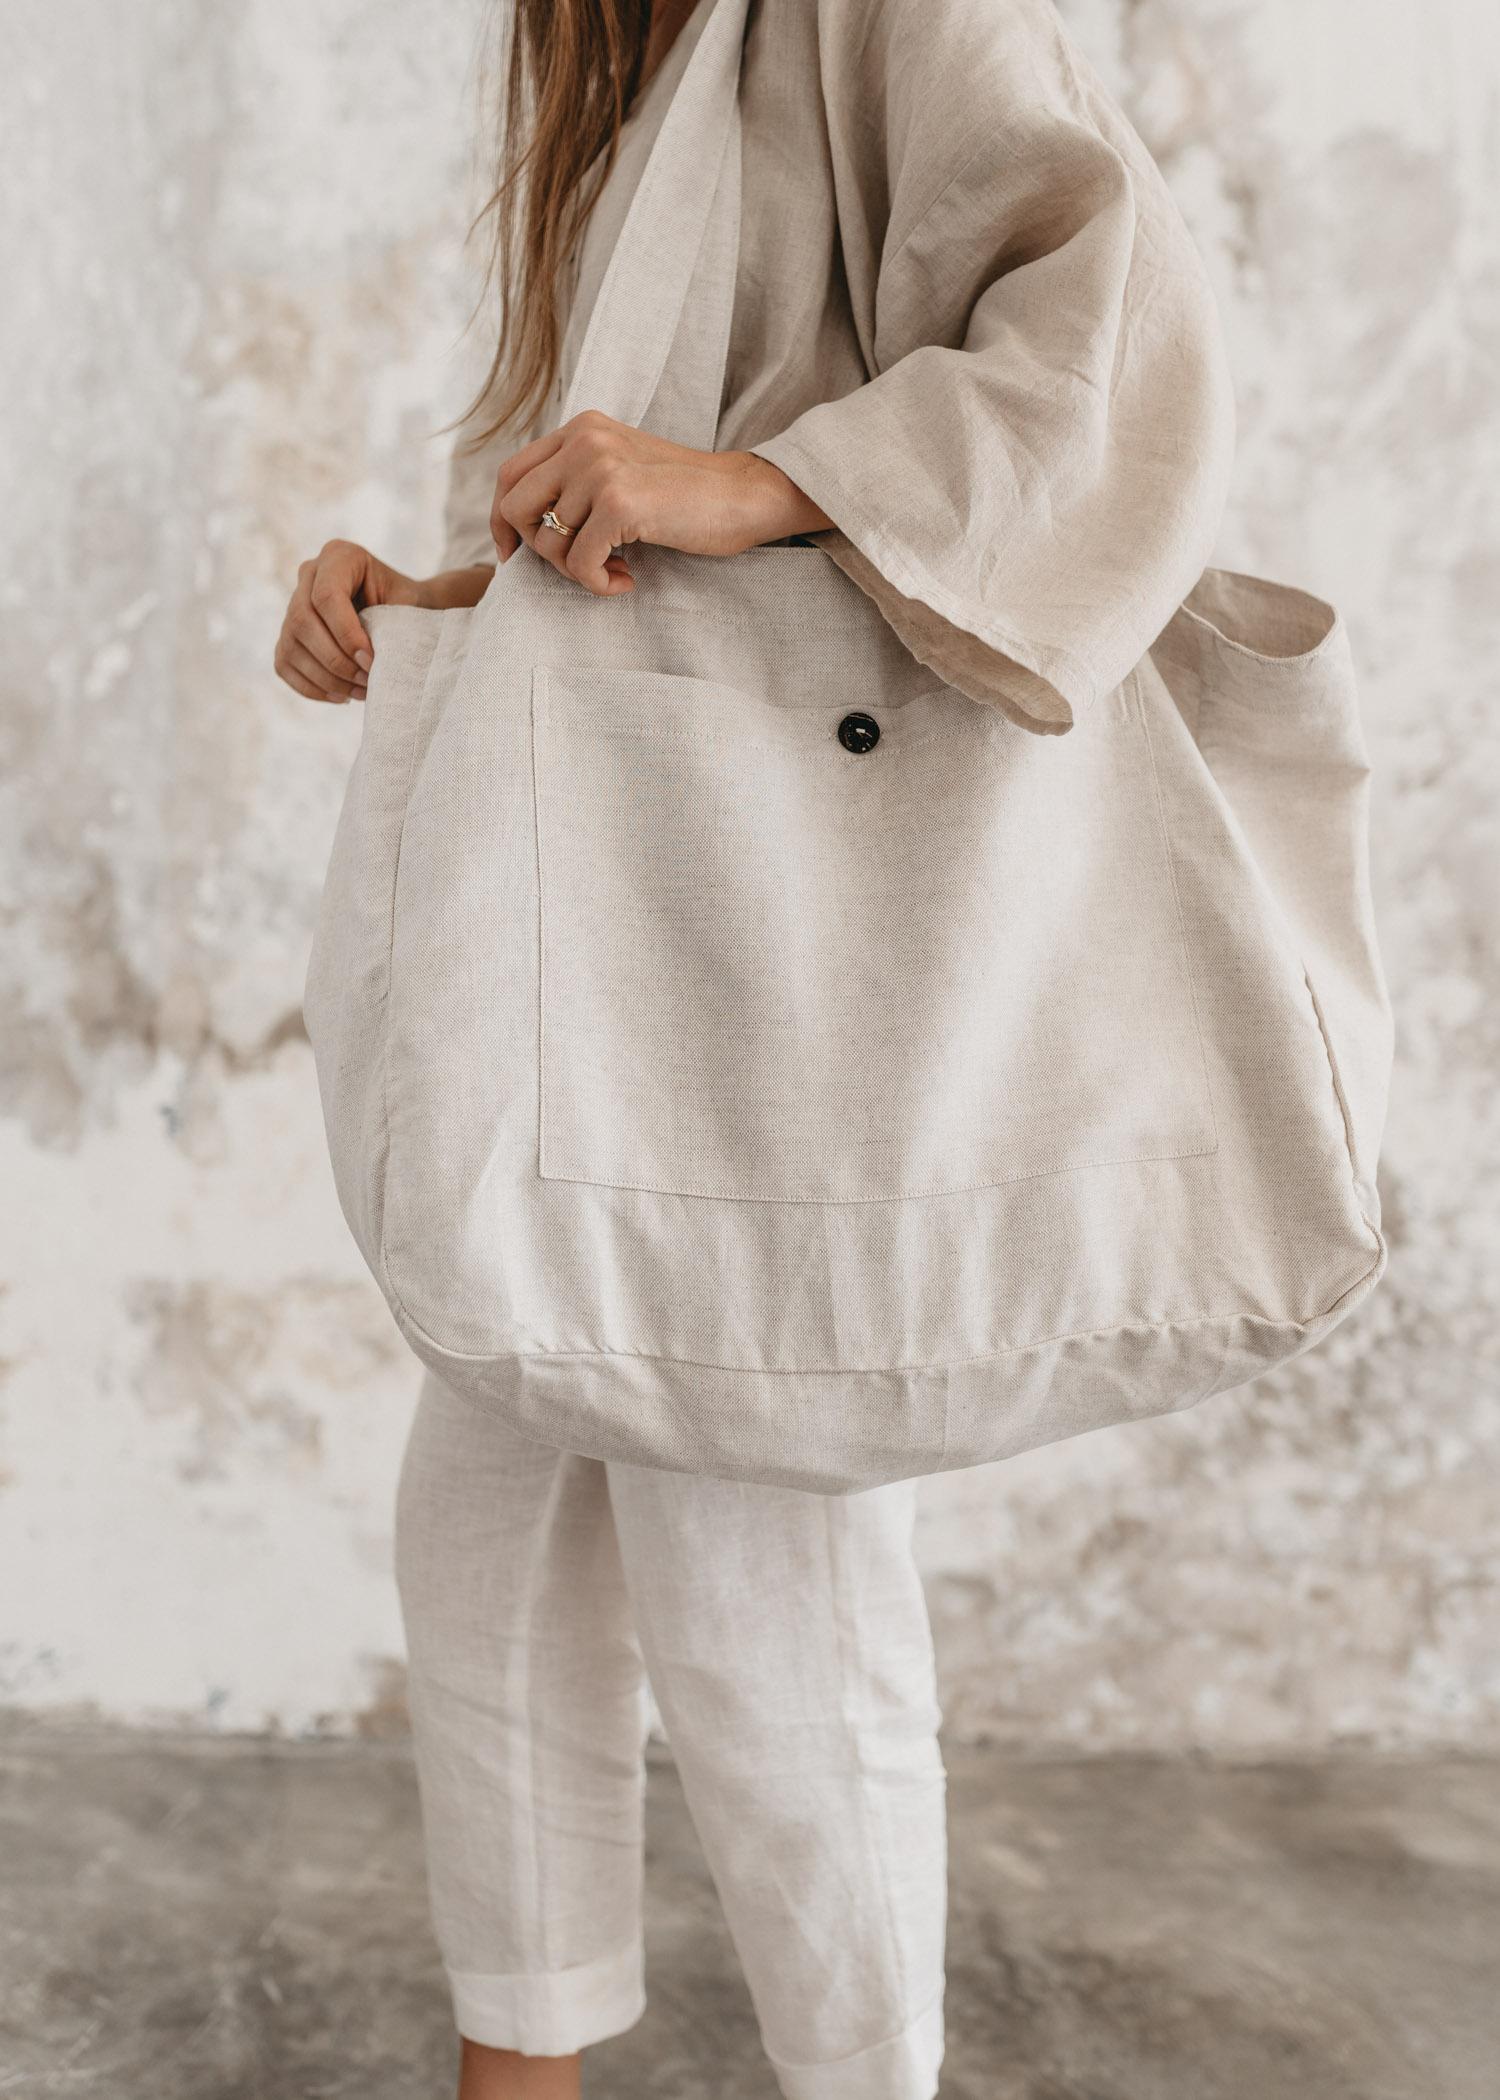 keira-mason-nowhere-and-everywhere-oversized-linen-bag.jpg